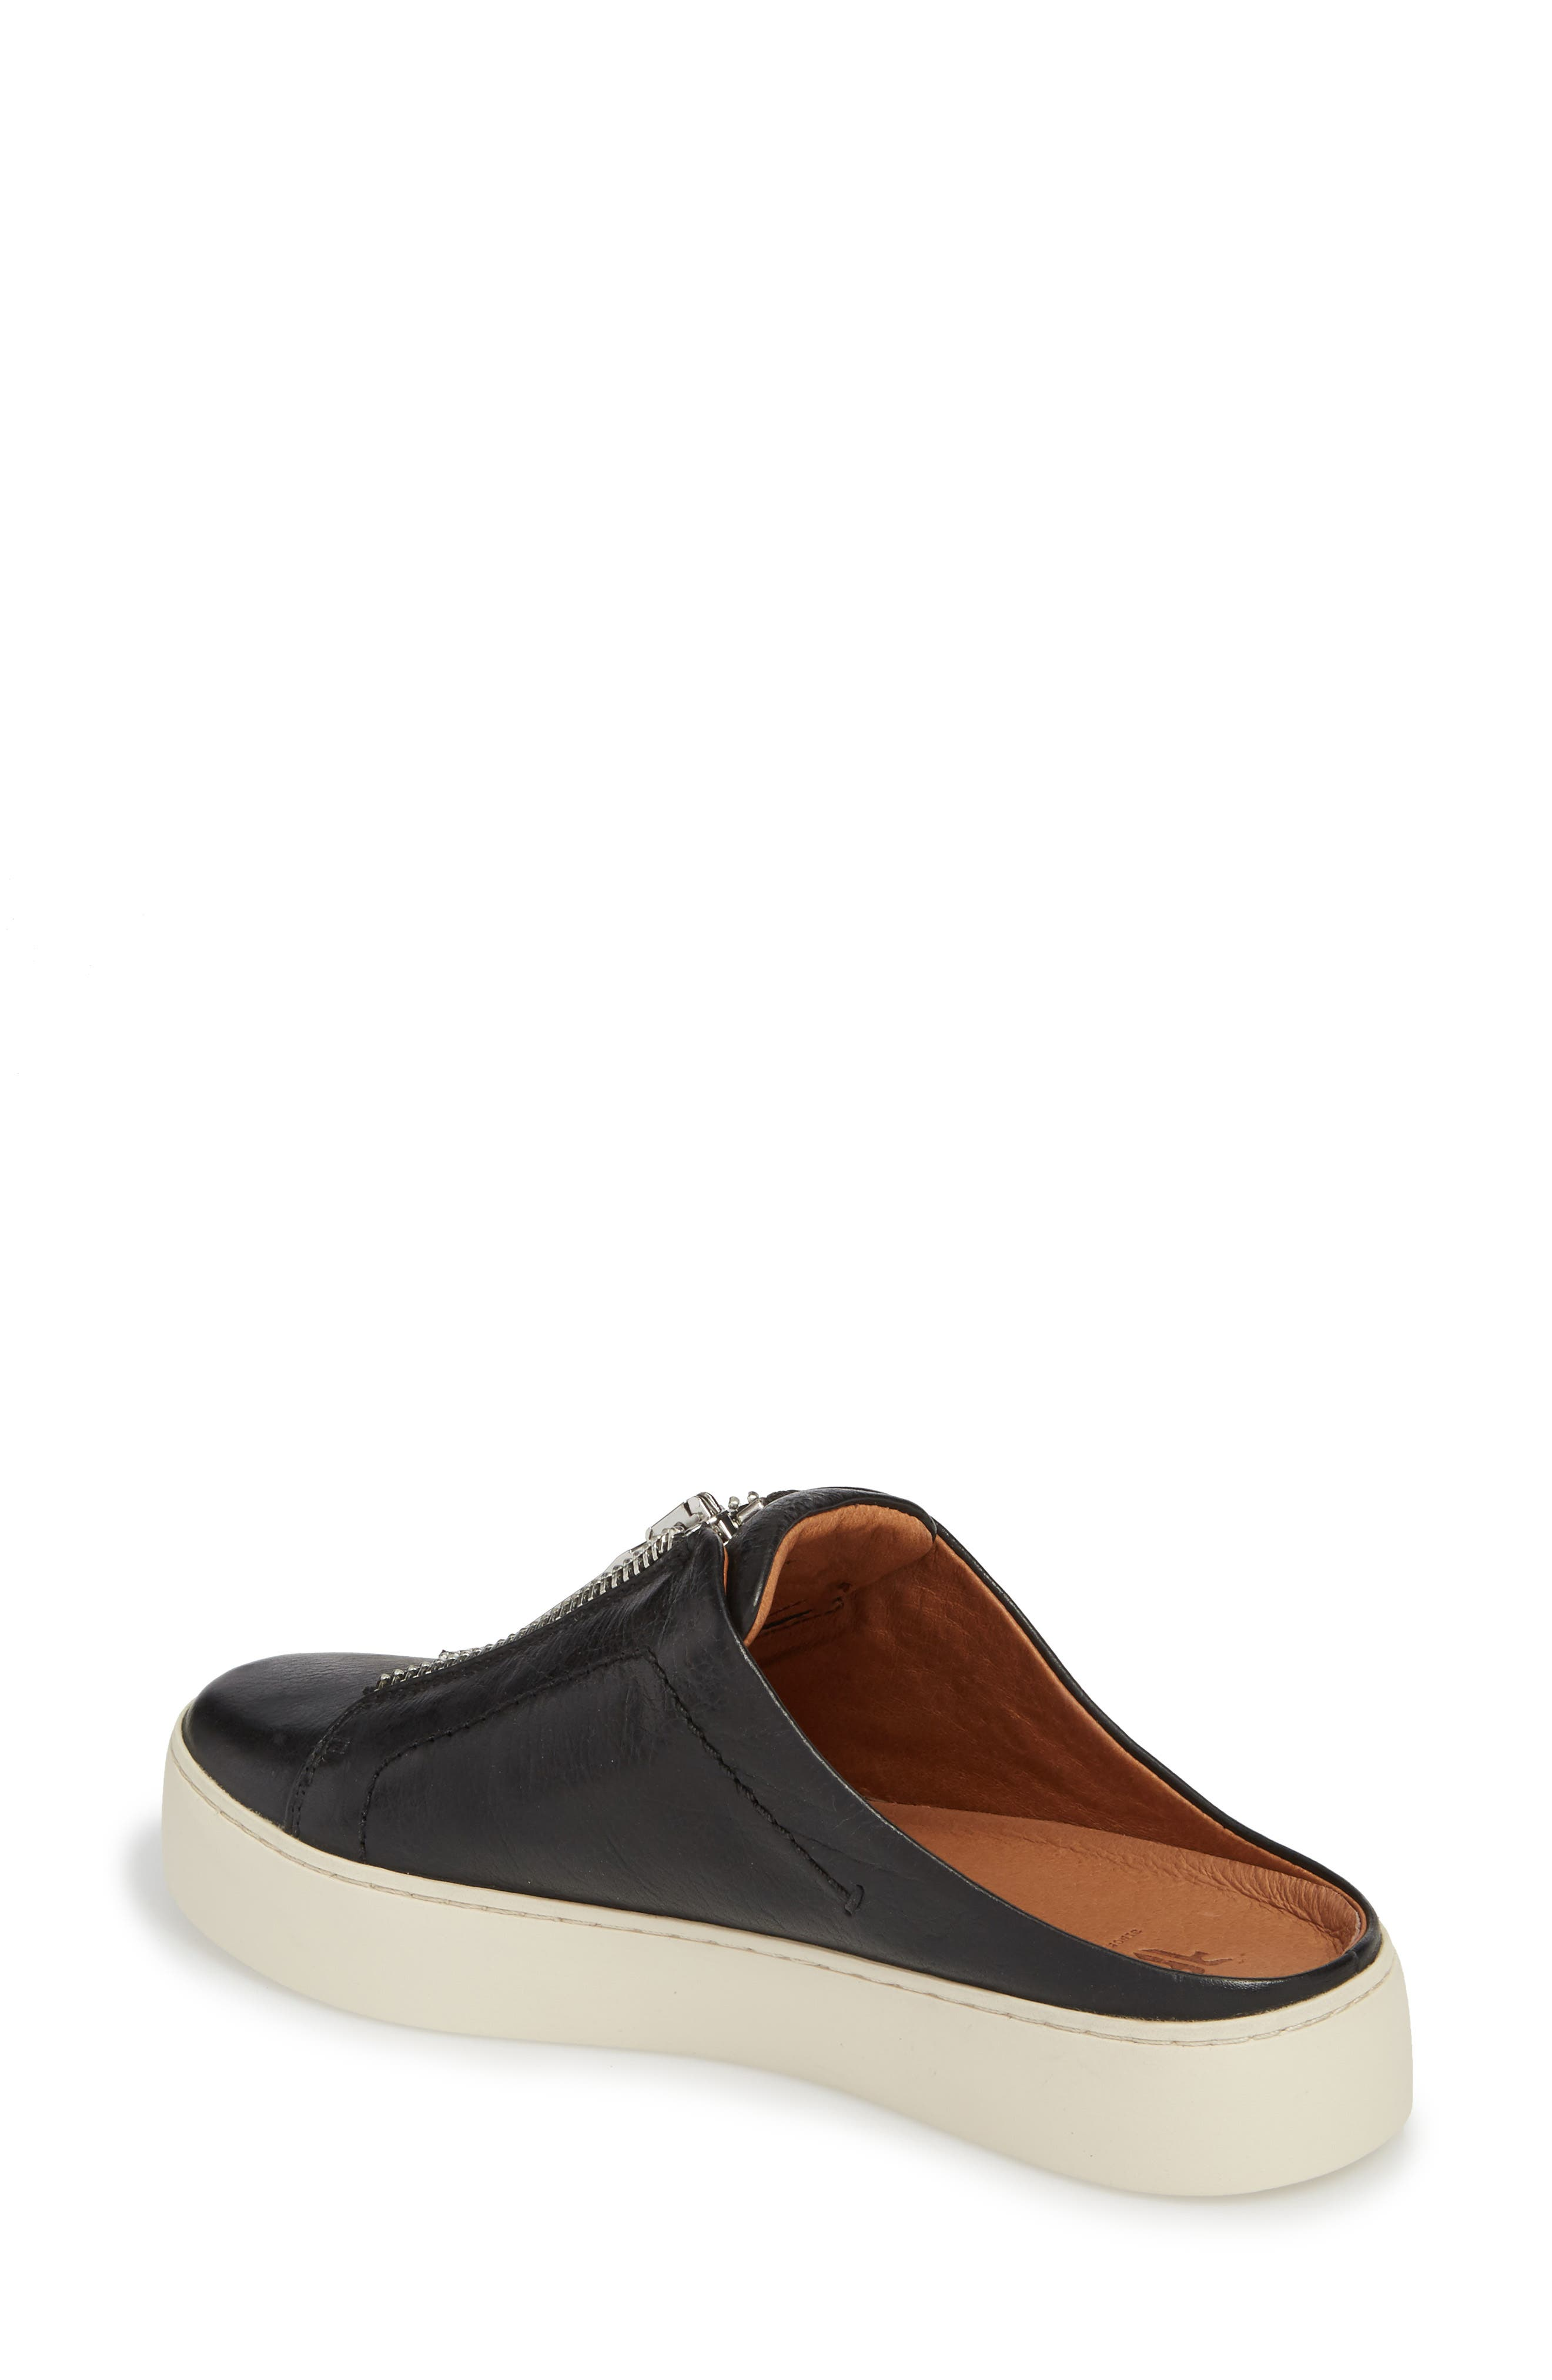 Lena Platform Sneaker Mule,                             Alternate thumbnail 2, color,                             001